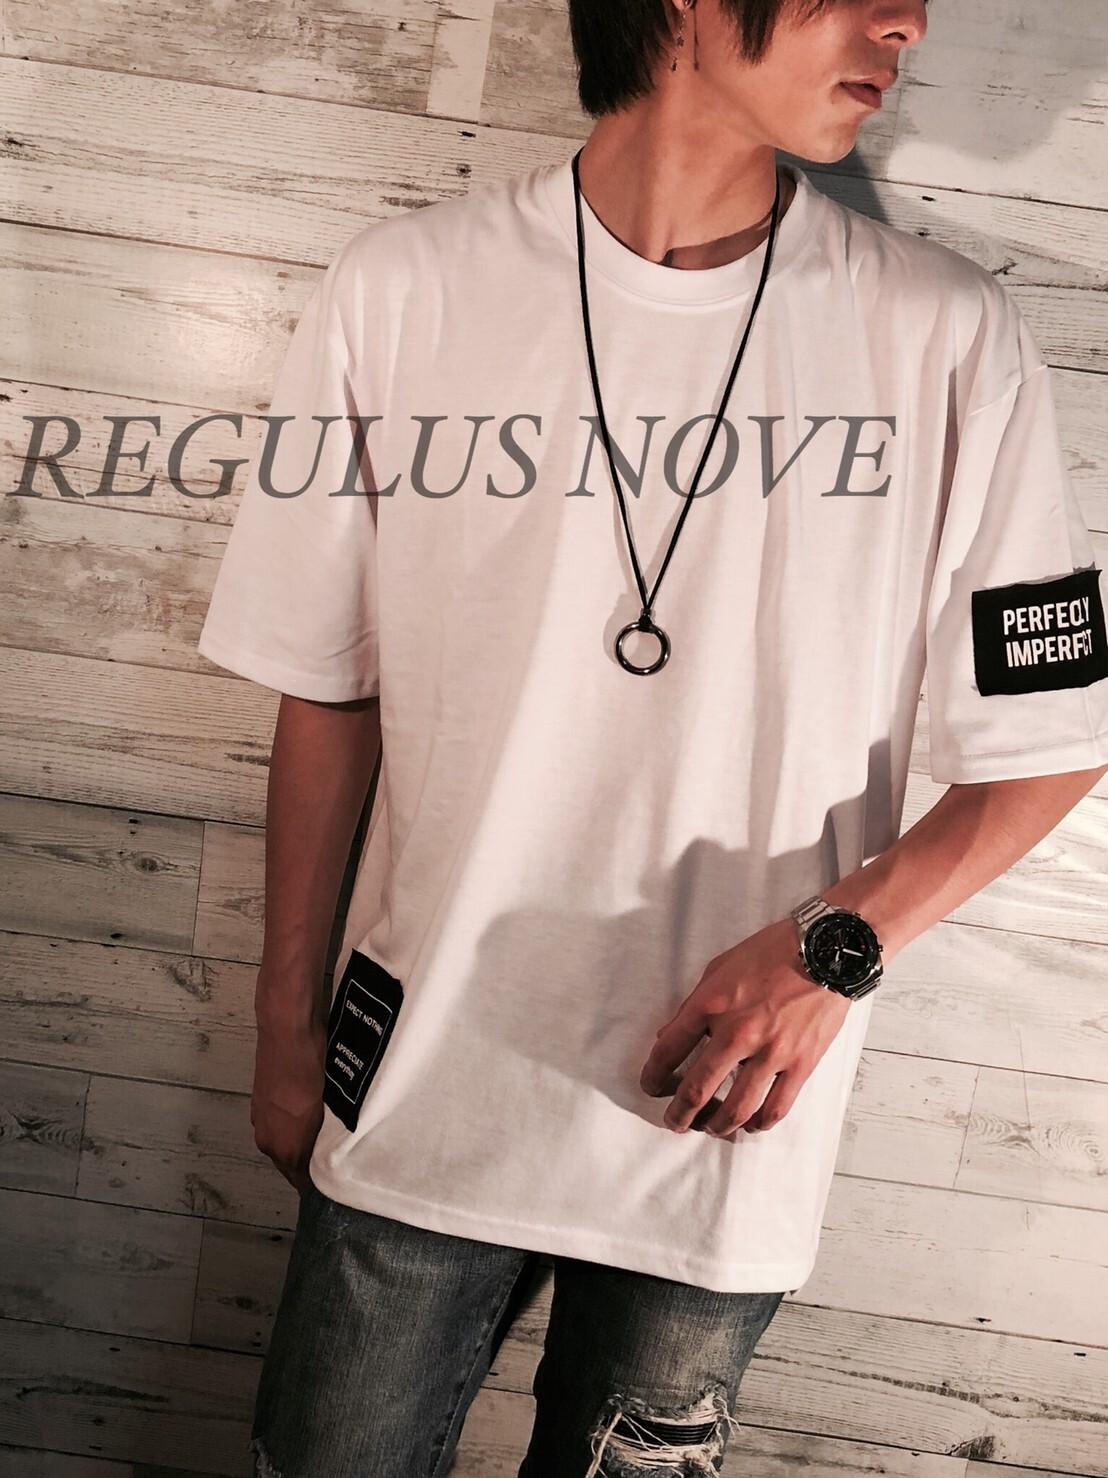 REGULUS NOVE デザインパッチBIGTシャツ WHITE ユニセックス レディース メンズ オーバーサイズ 大きいサイズ 派手 個性的 ストリート ロック